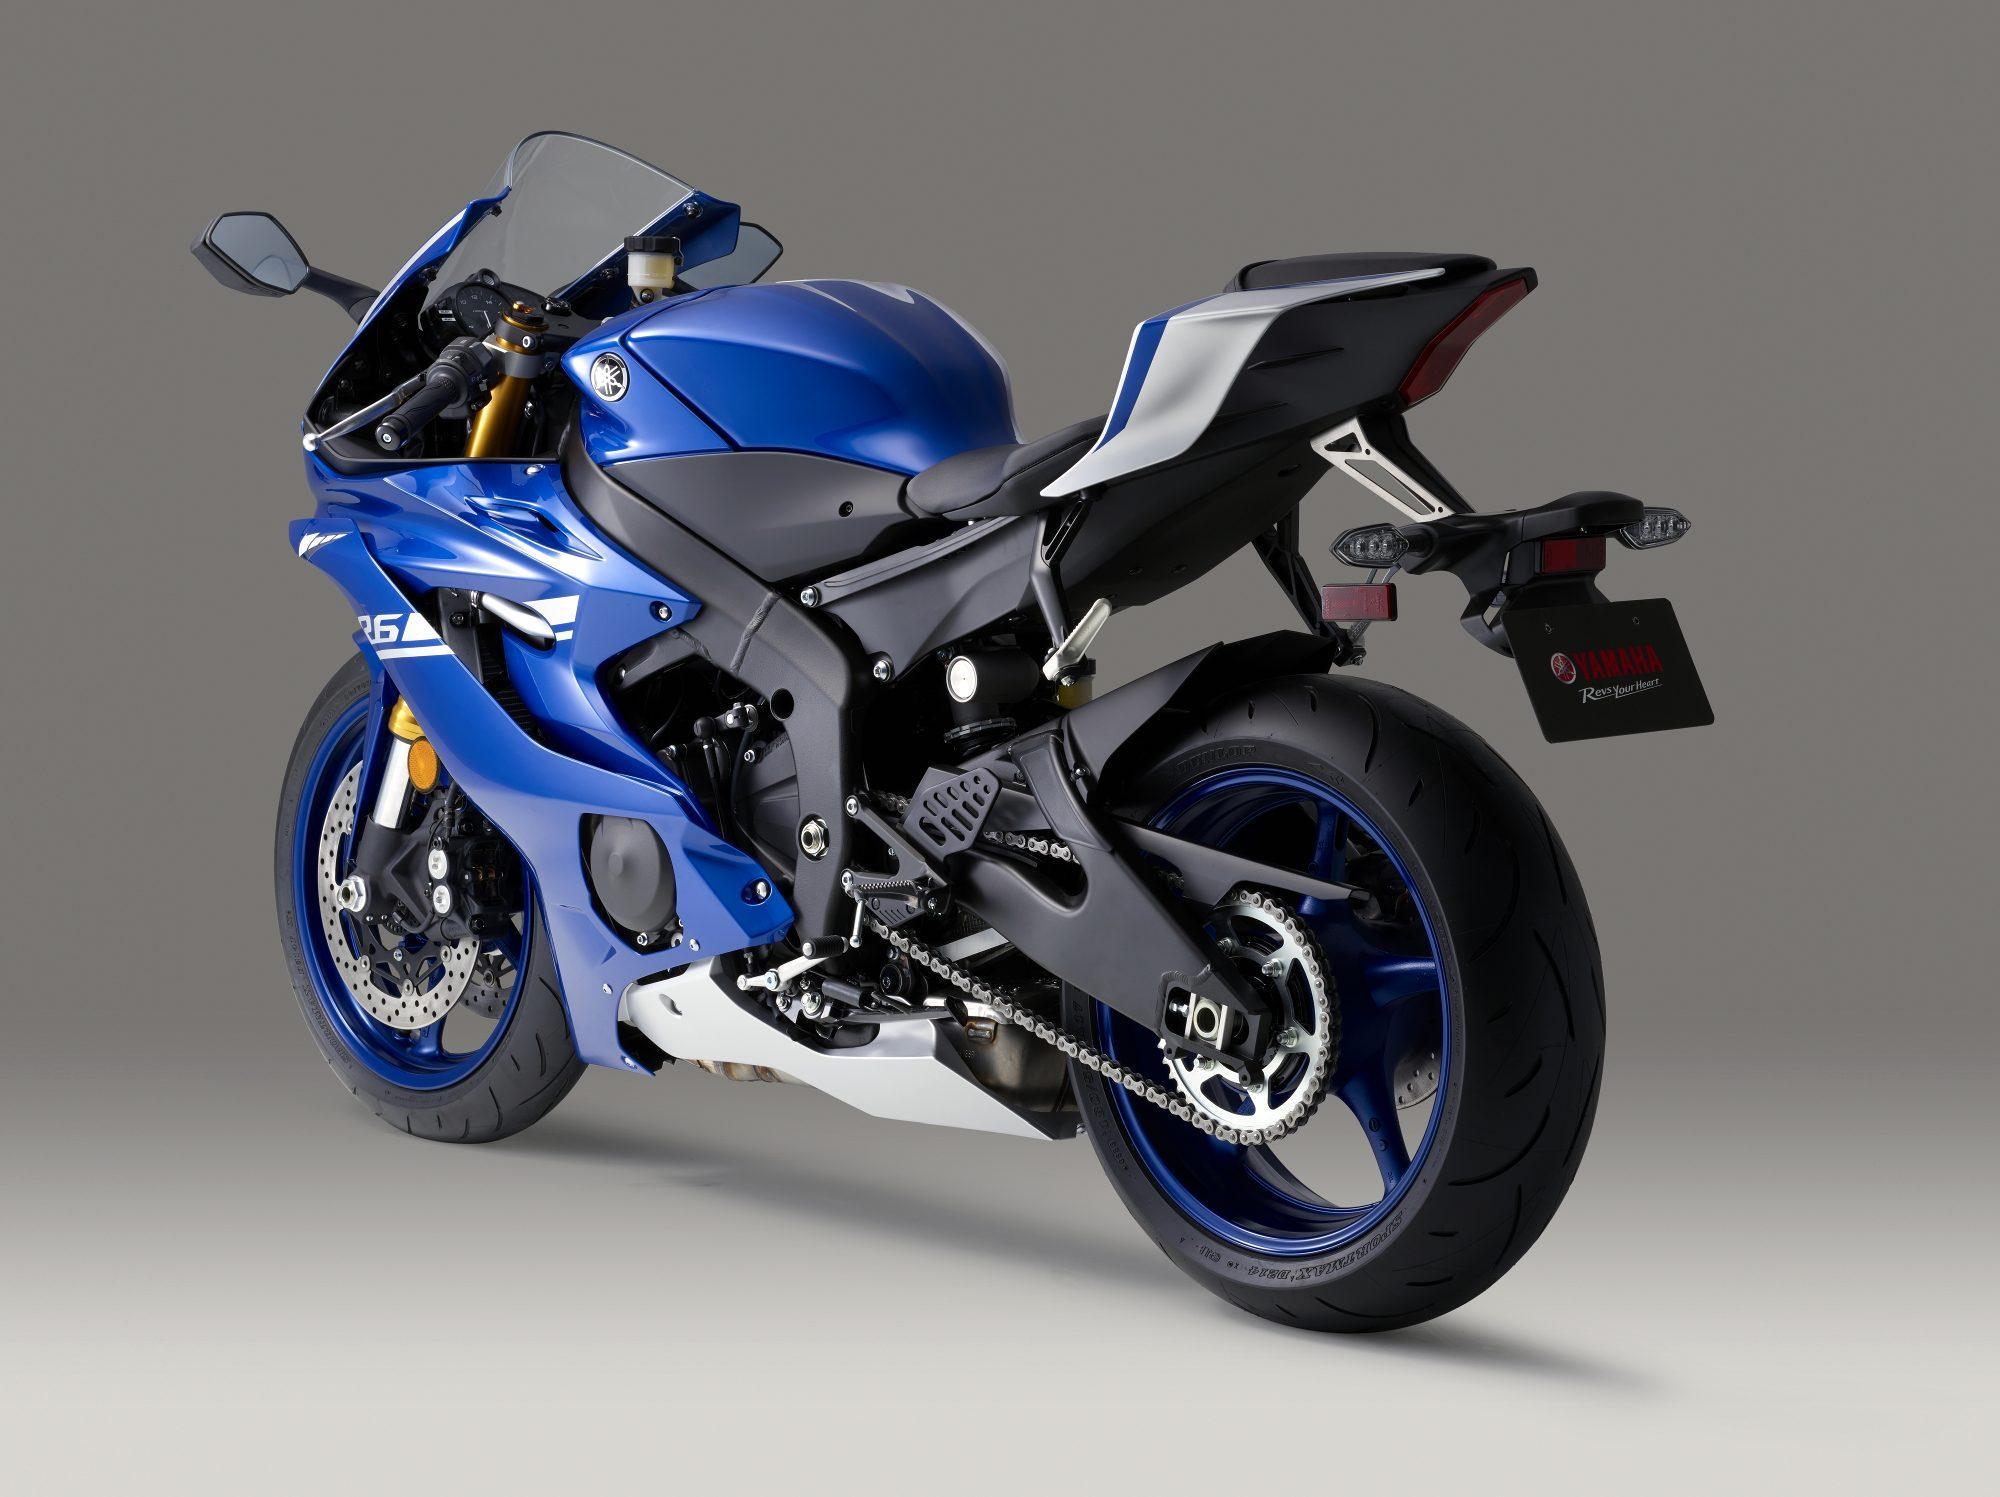 Yamaha Quickshifter